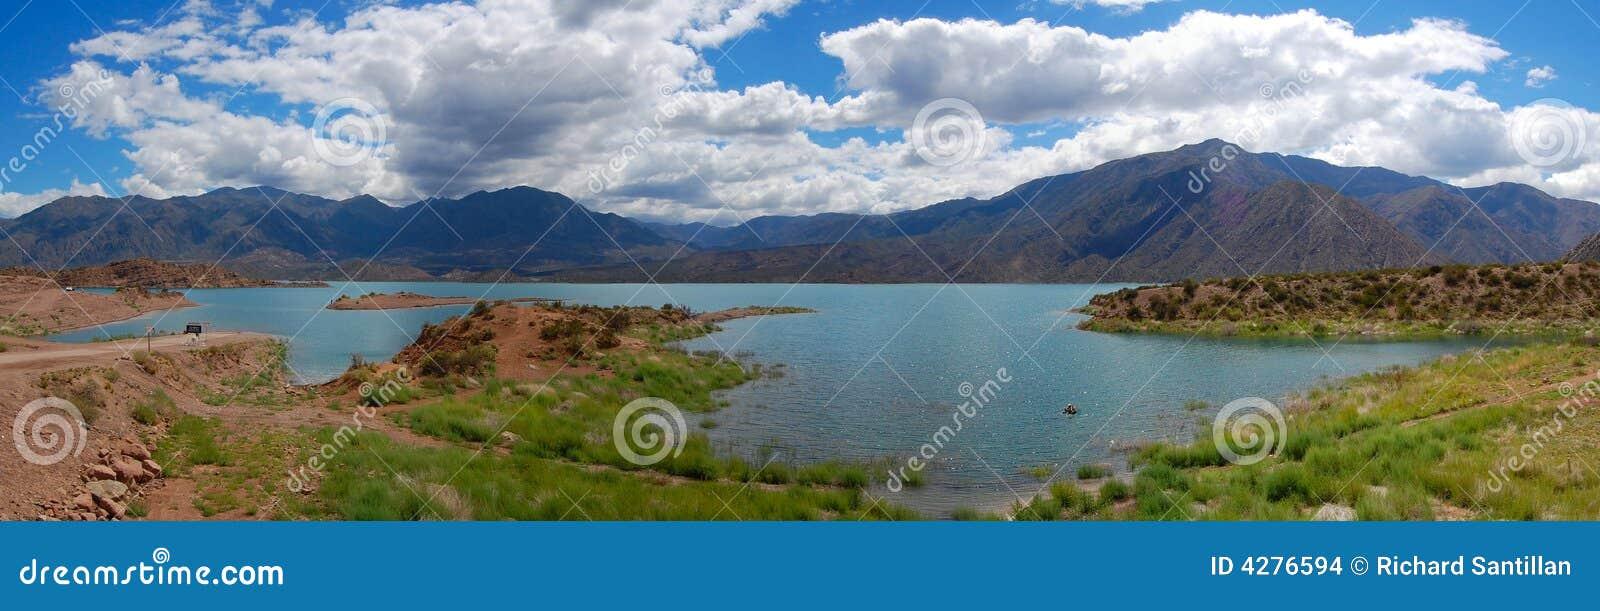 Lac Potrerillos panoramique